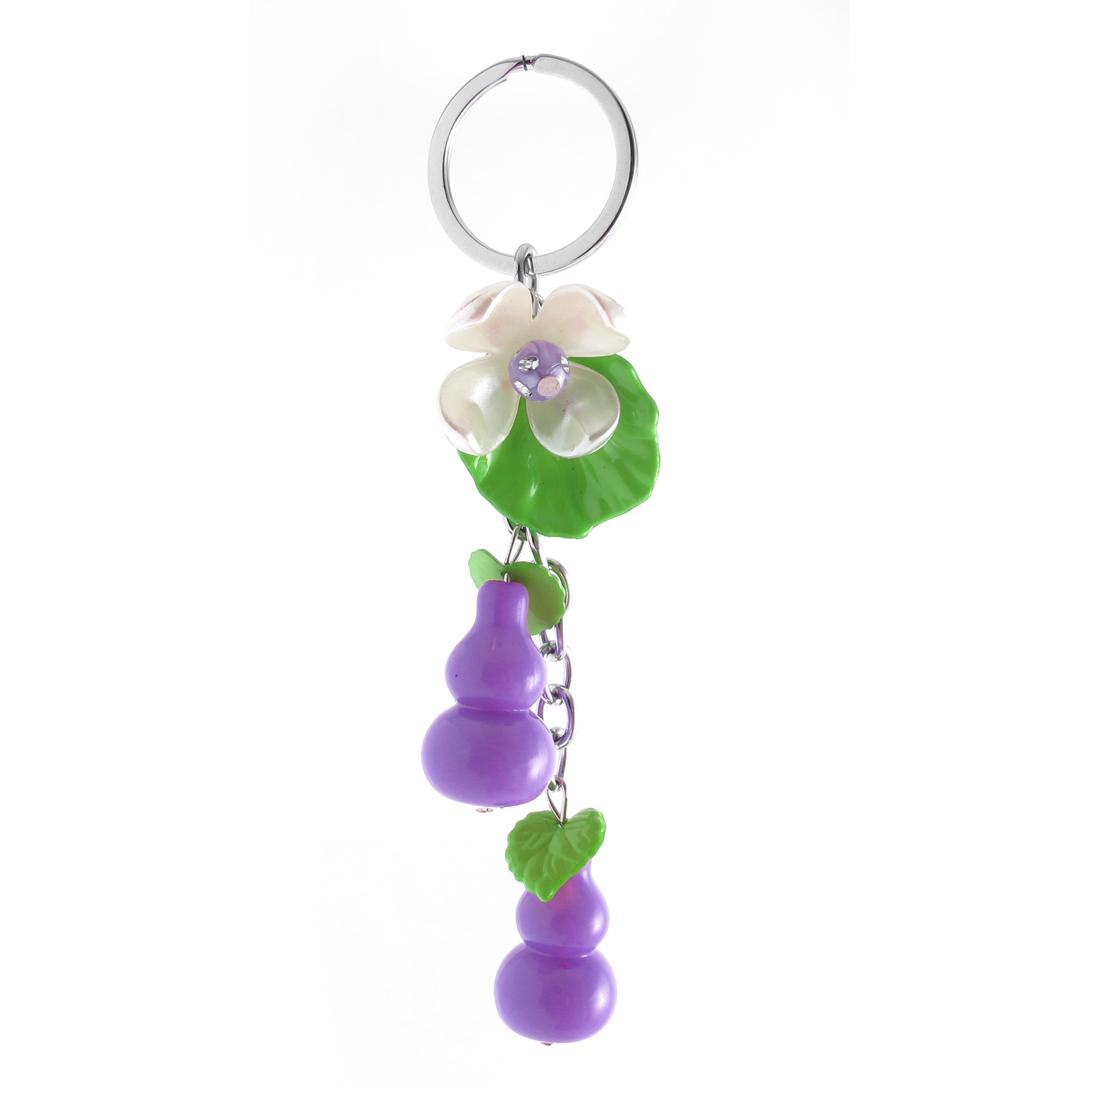 Purple Plastic Calabash Flower Pendant Keychain Keyring Key Chain Ring Handbag Purse Ornament Gift